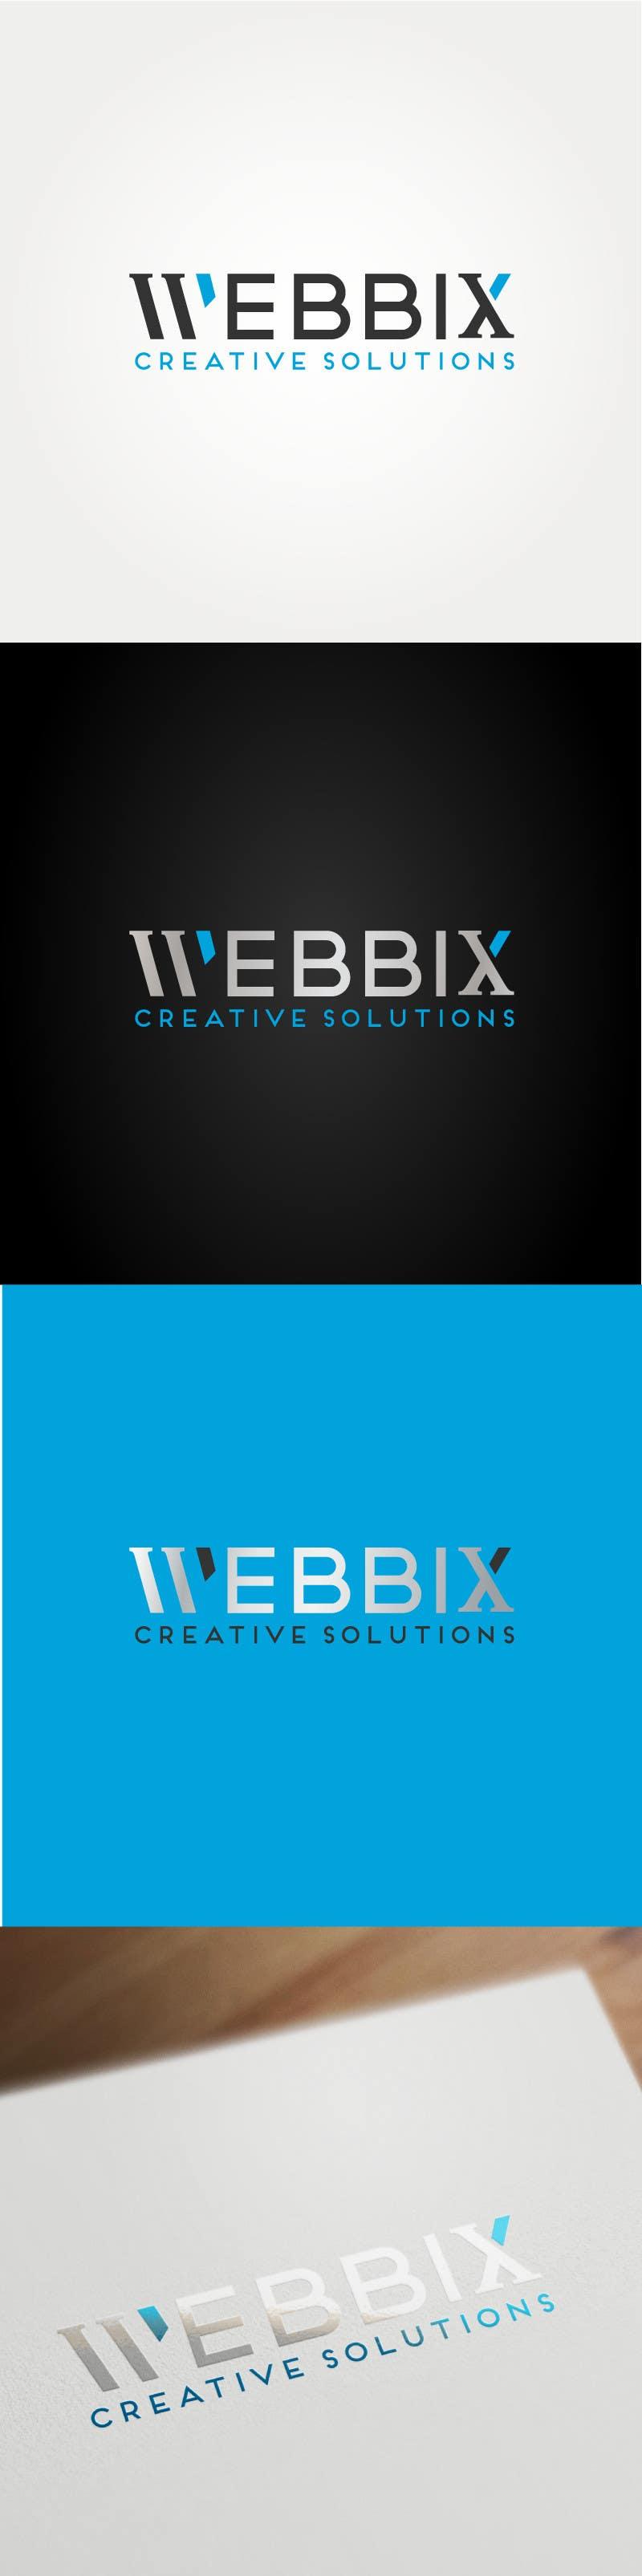 #173 for Design new Logo for Internet company by simoneferranti